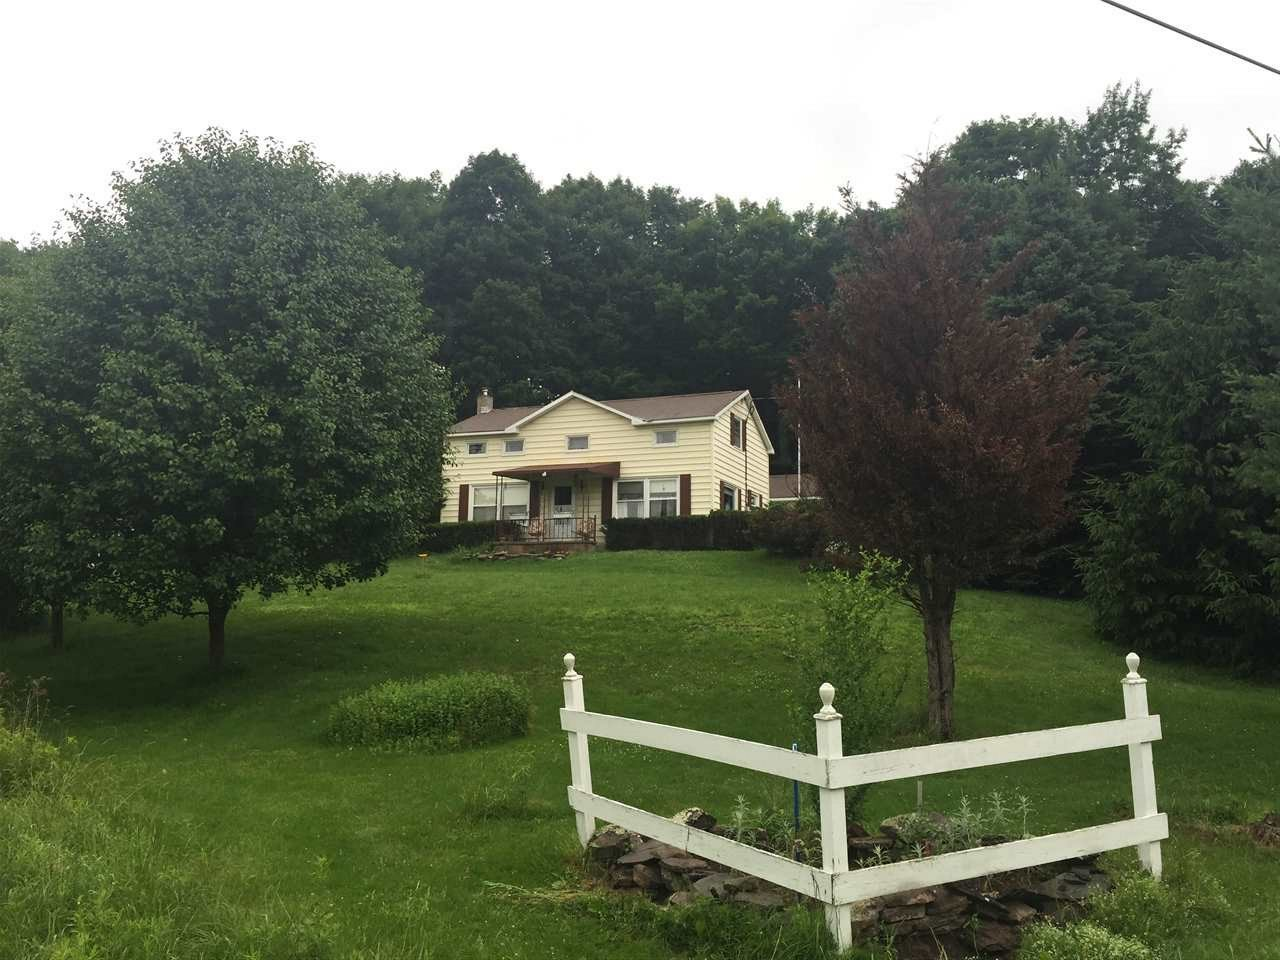 Real Estate for Sale, ListingId: 34138451, Woodbourne,NY12788